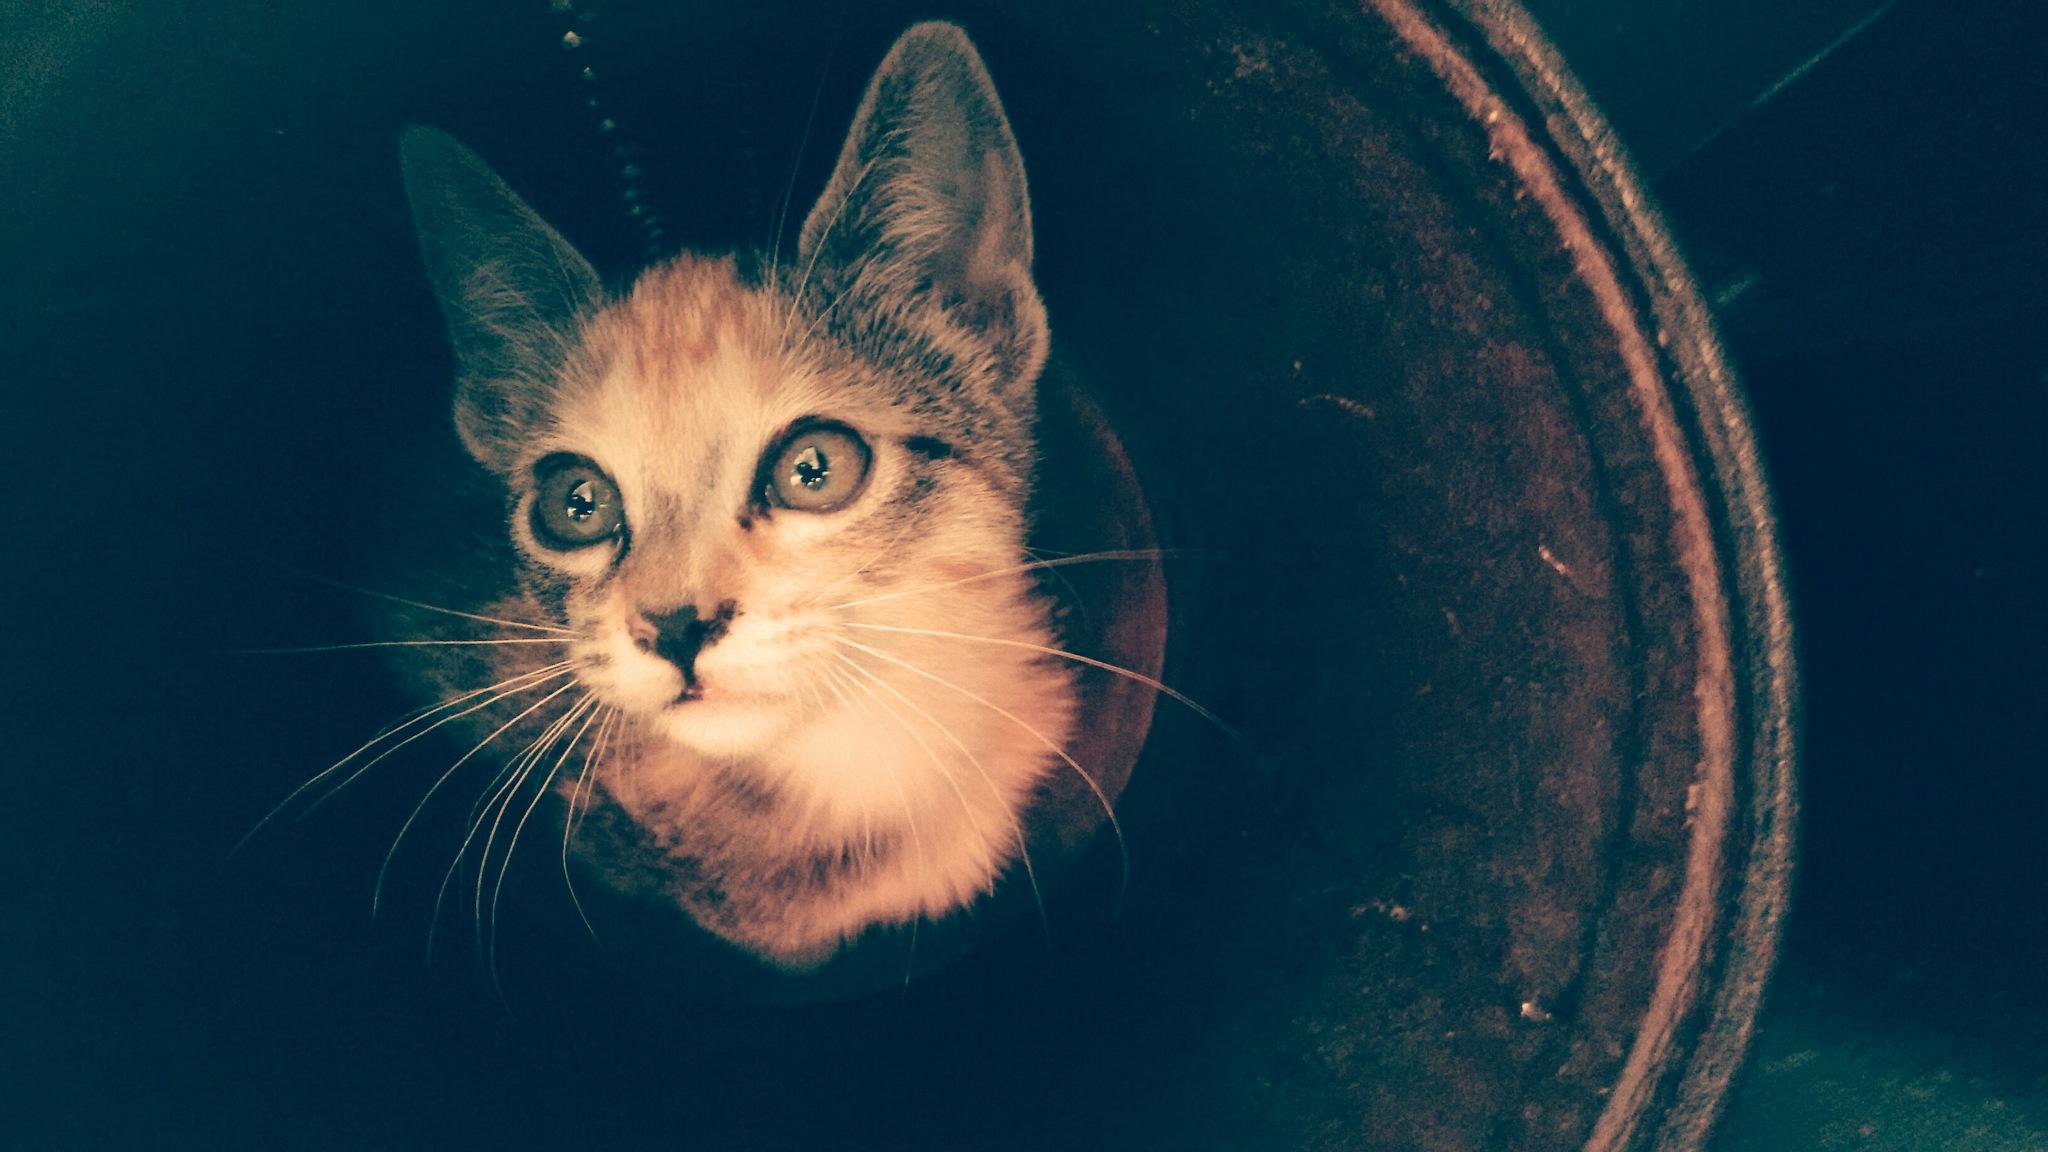 cat by dsg fotoestudio